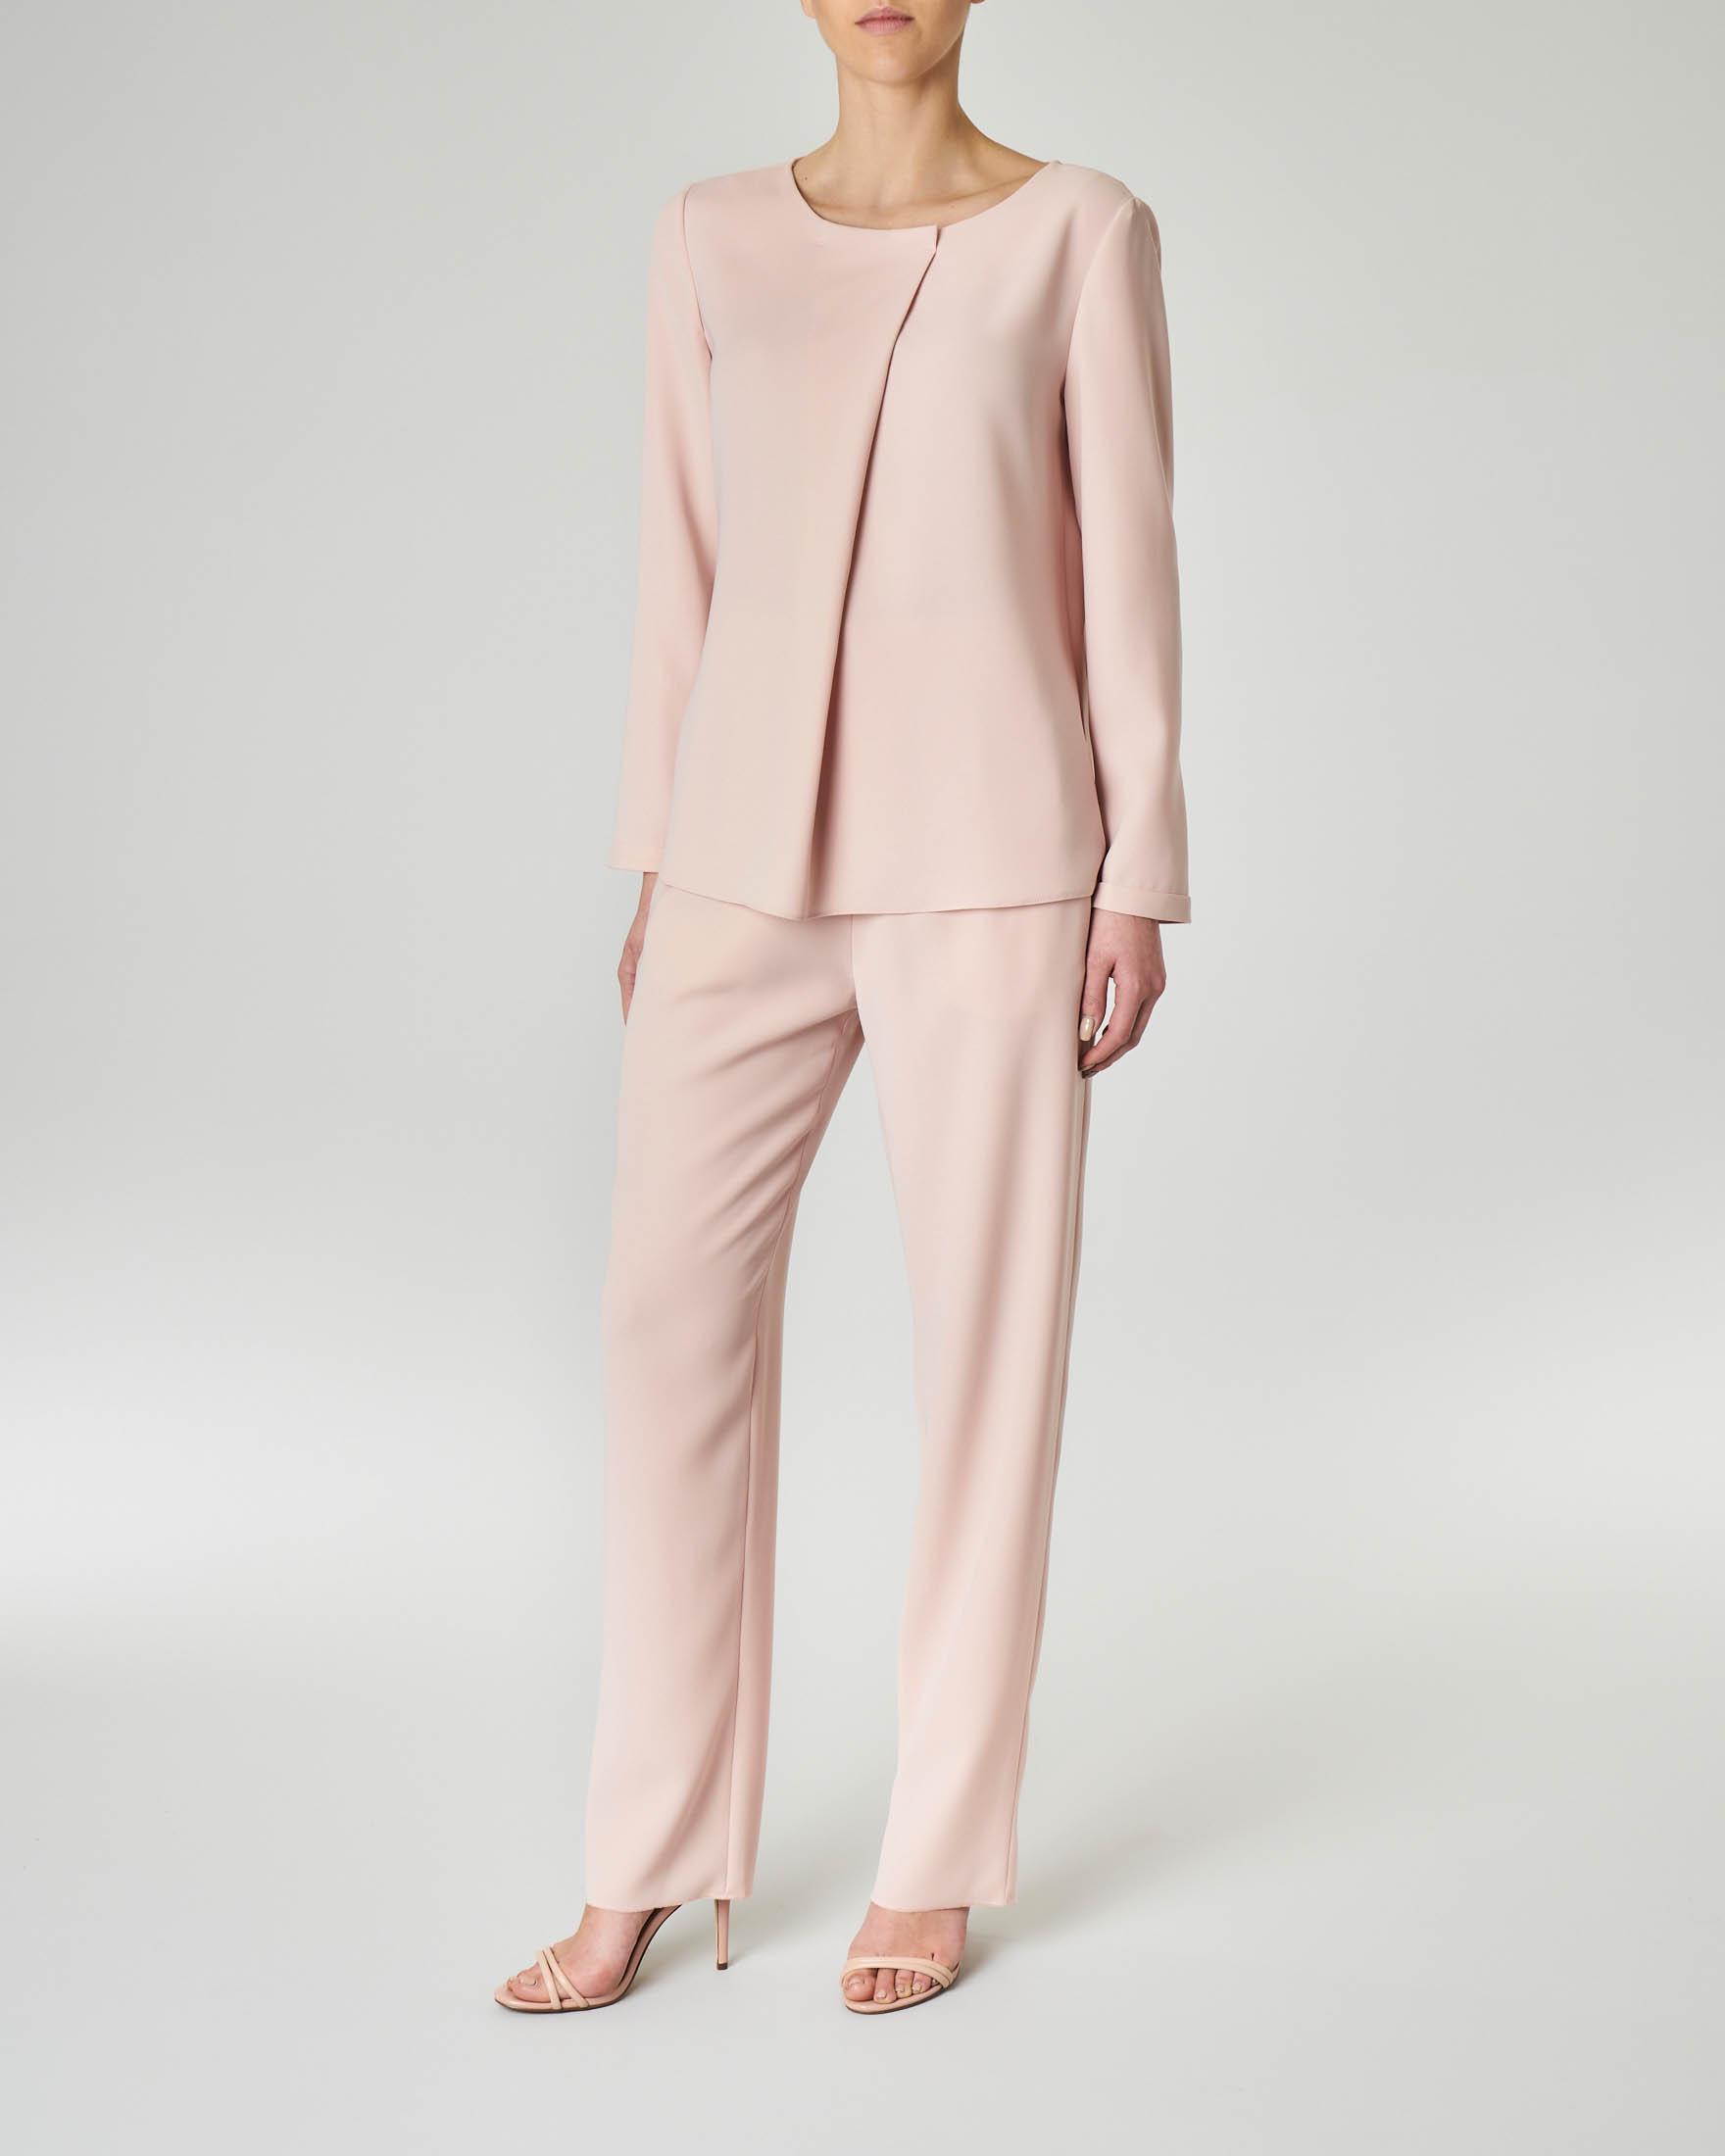 Completo giacca pantalone rosa in cady con giacca senza bottoni